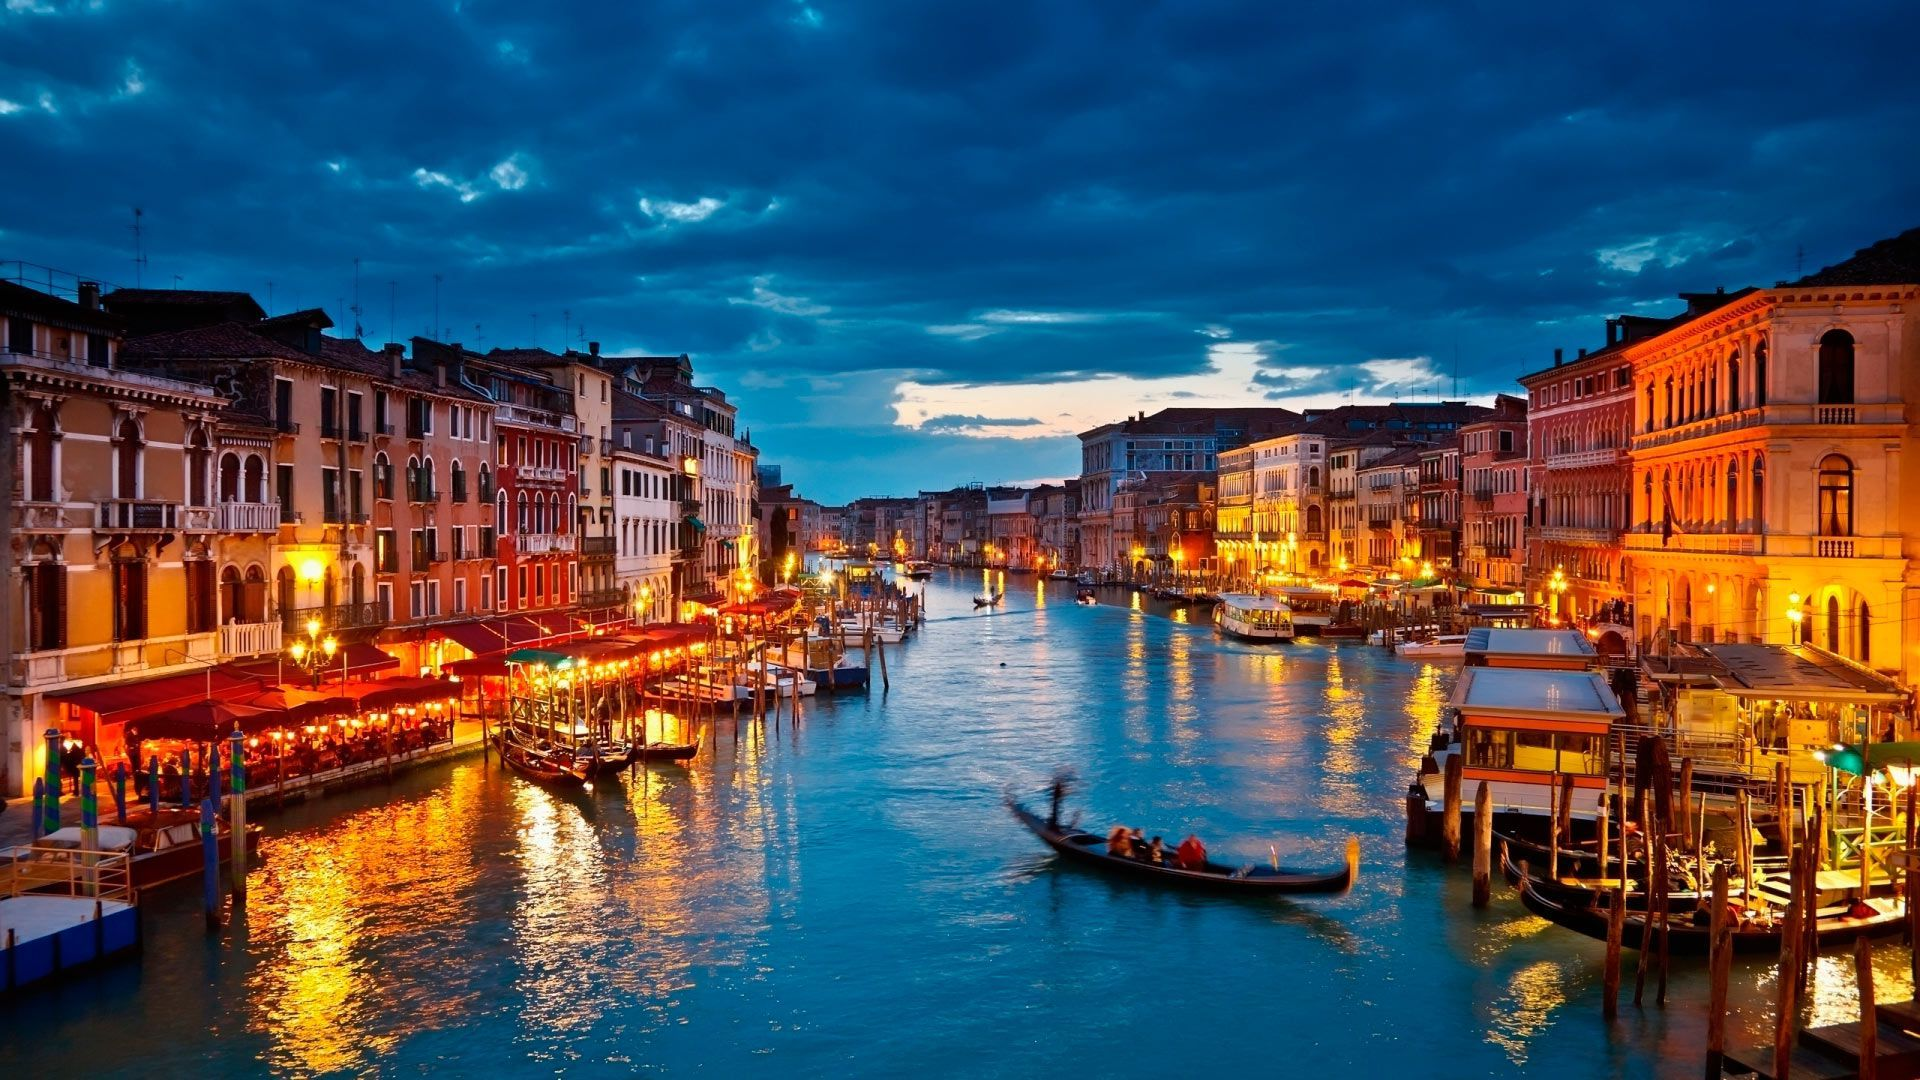 Venice Italy Wallpaper   52DazheW Gallery 1920x1080